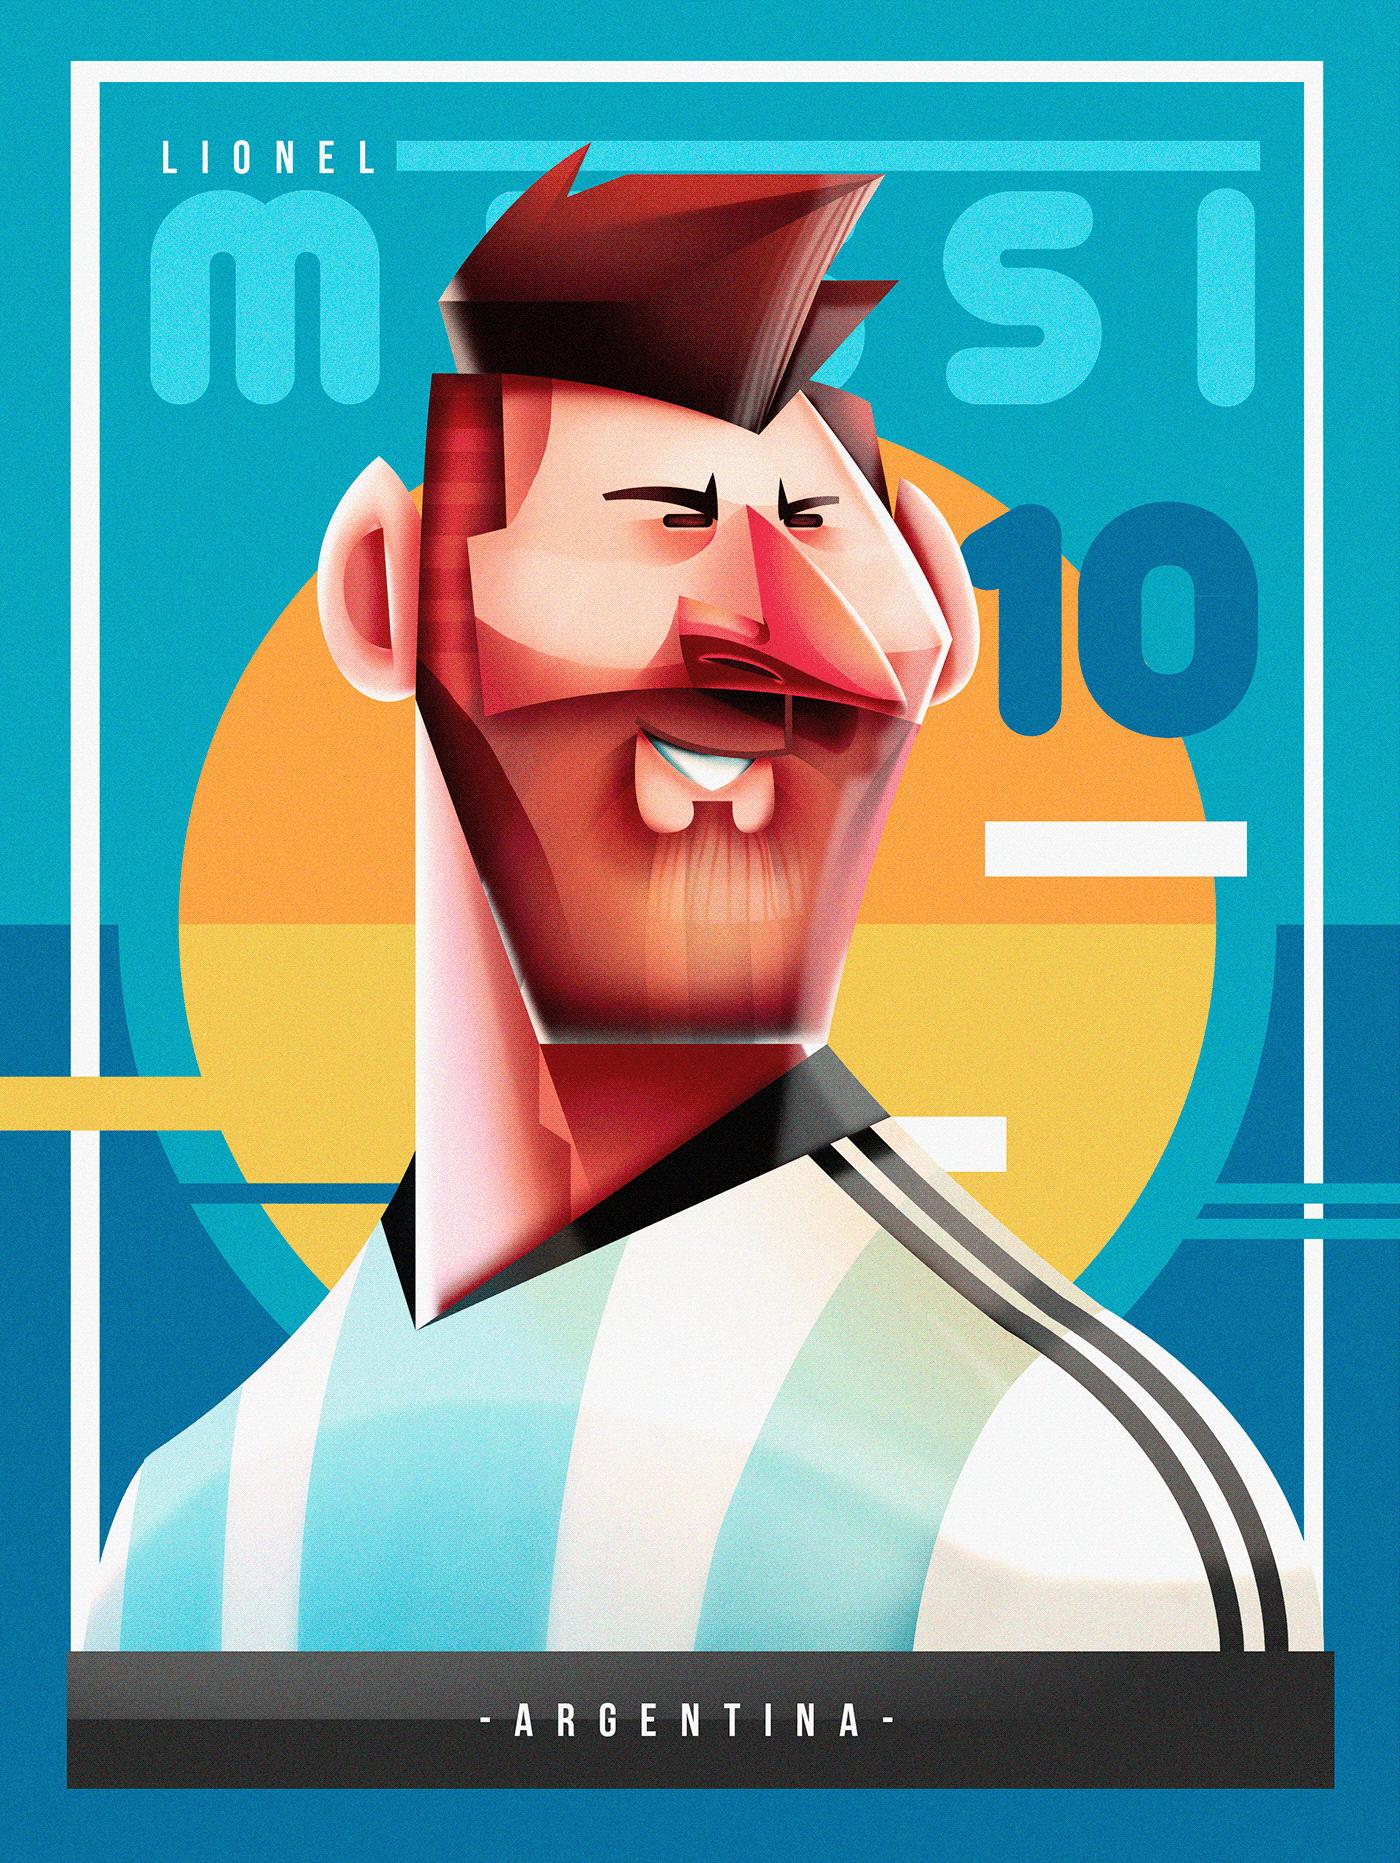 cartoon deporte Futbol GOL messi Neymar Ronaldo soccer sports